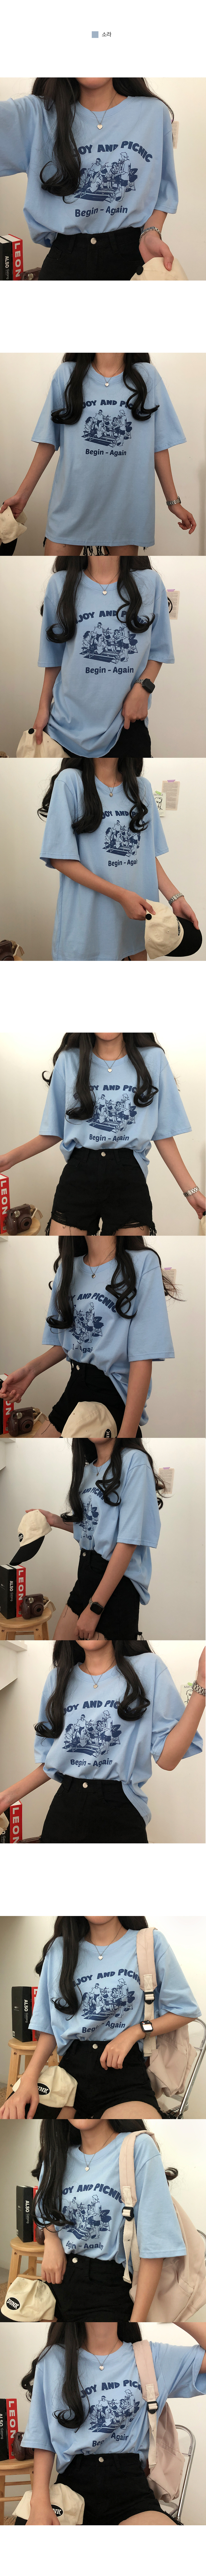 Begin Again Print Short Sleeve T-shirt